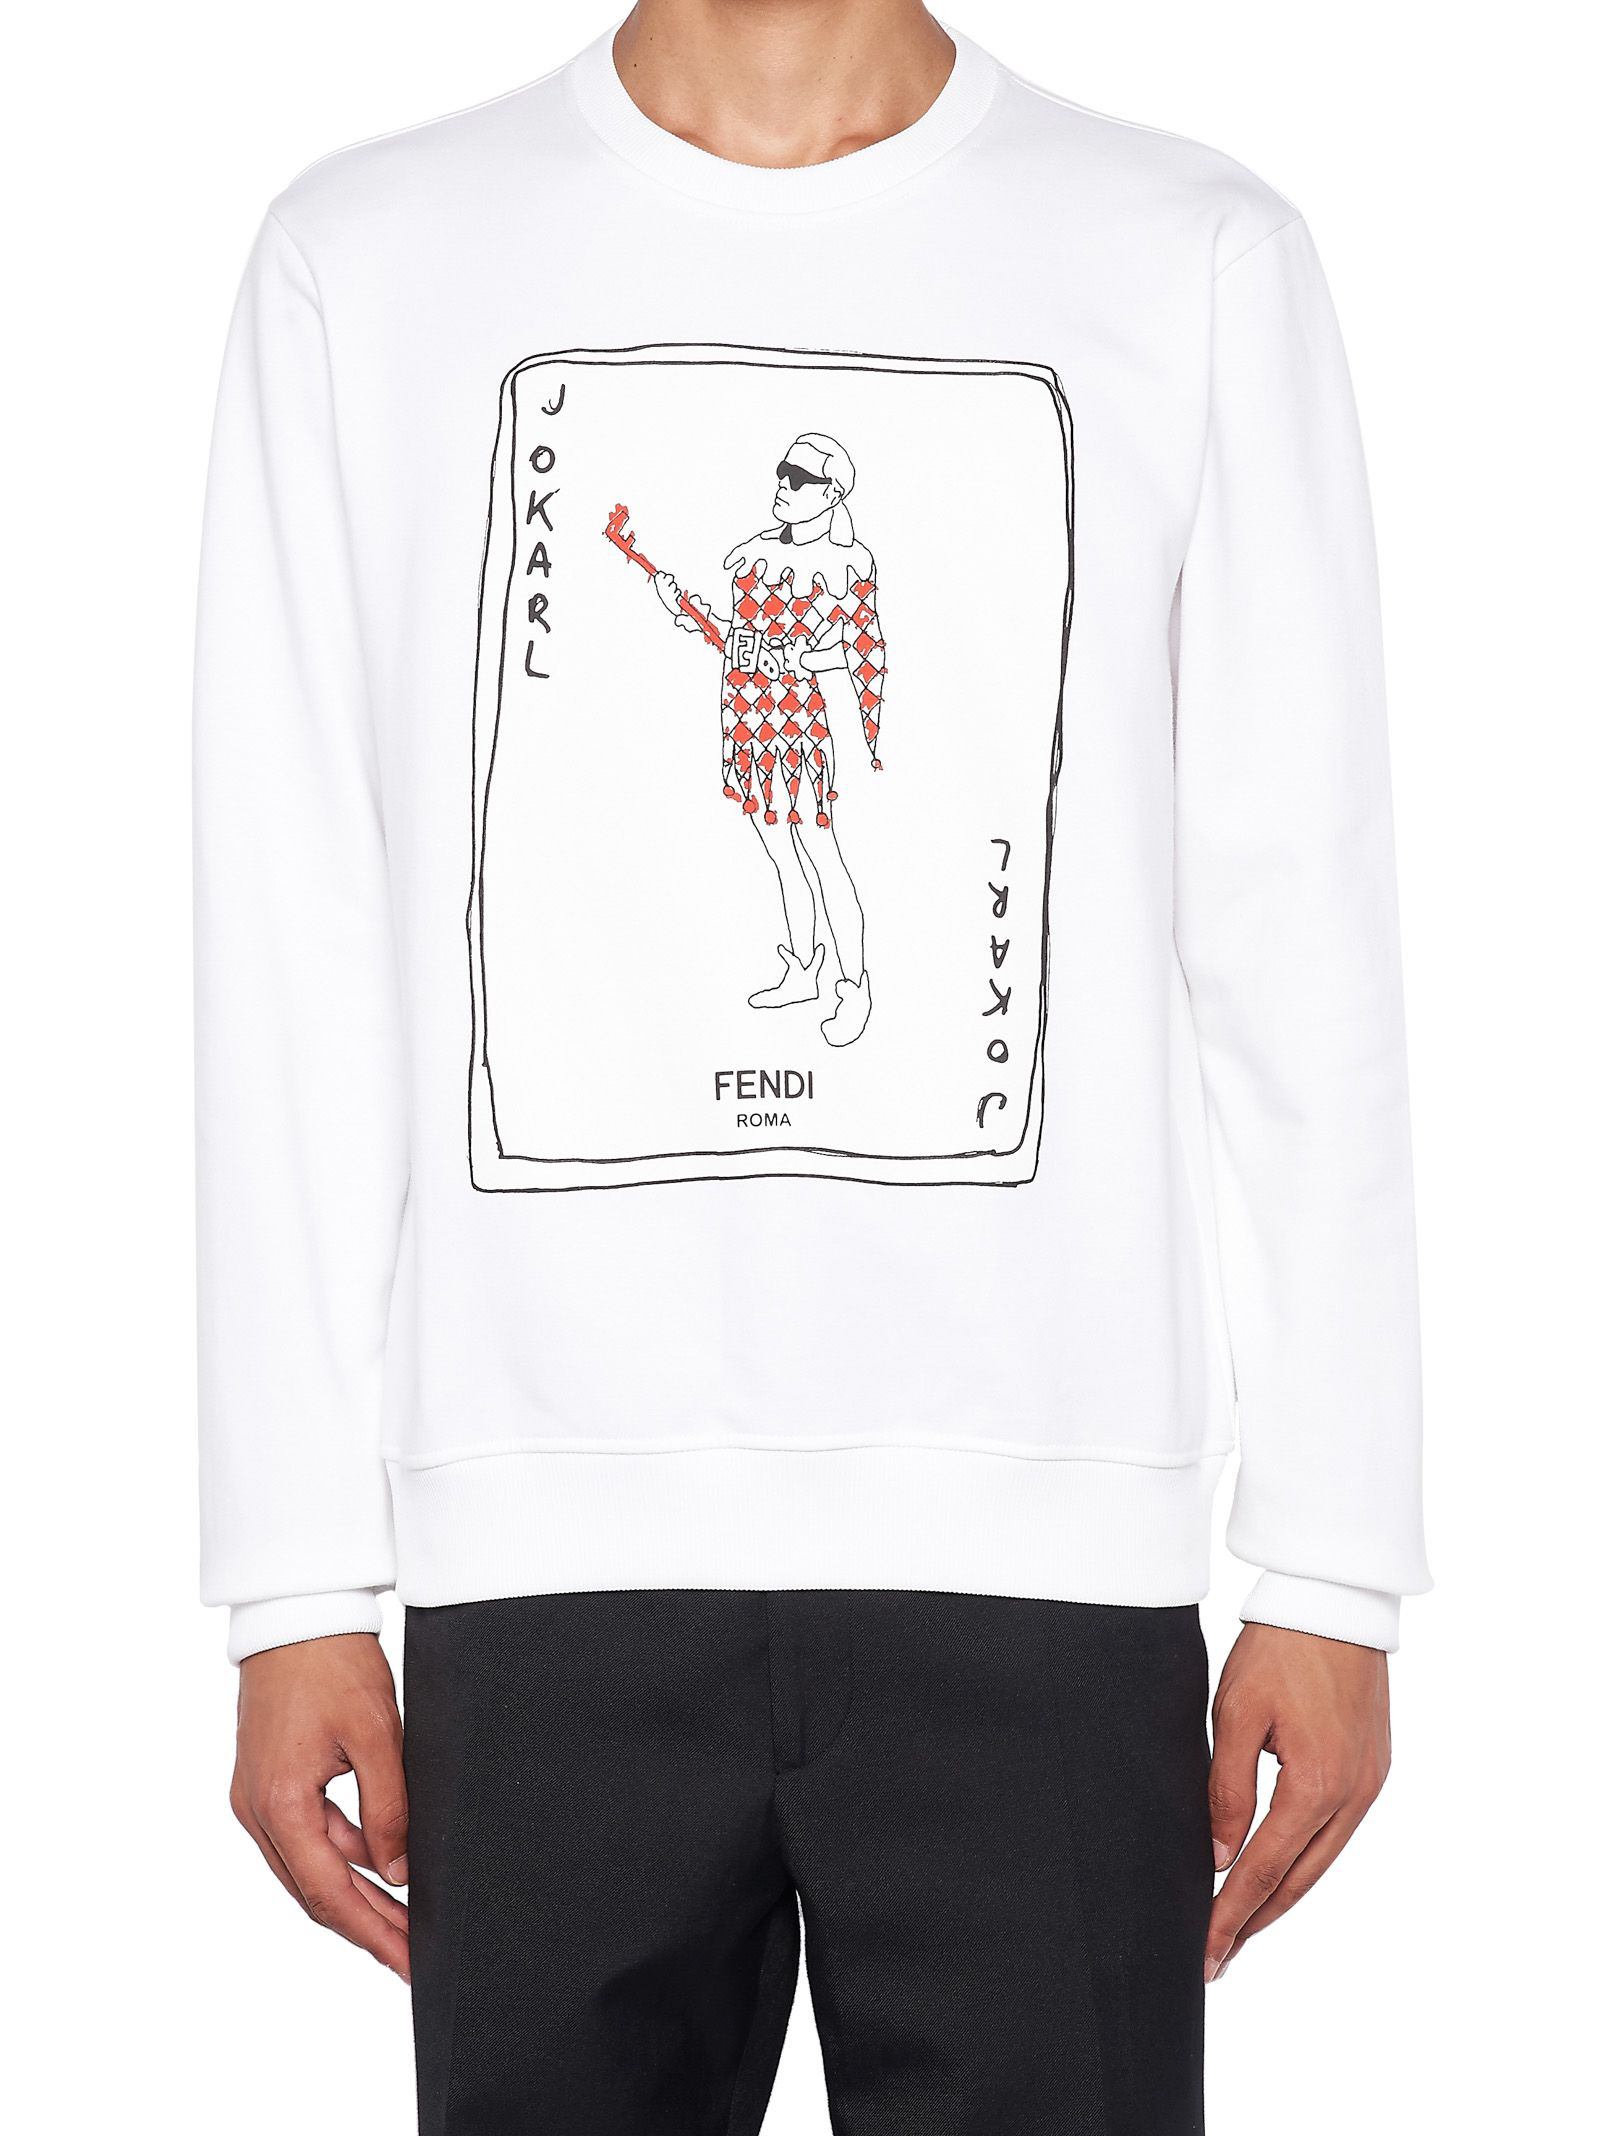 ec6a94c0b Fendi Jokarl Fashion Show Print Sweatshirt - White | ModeSens